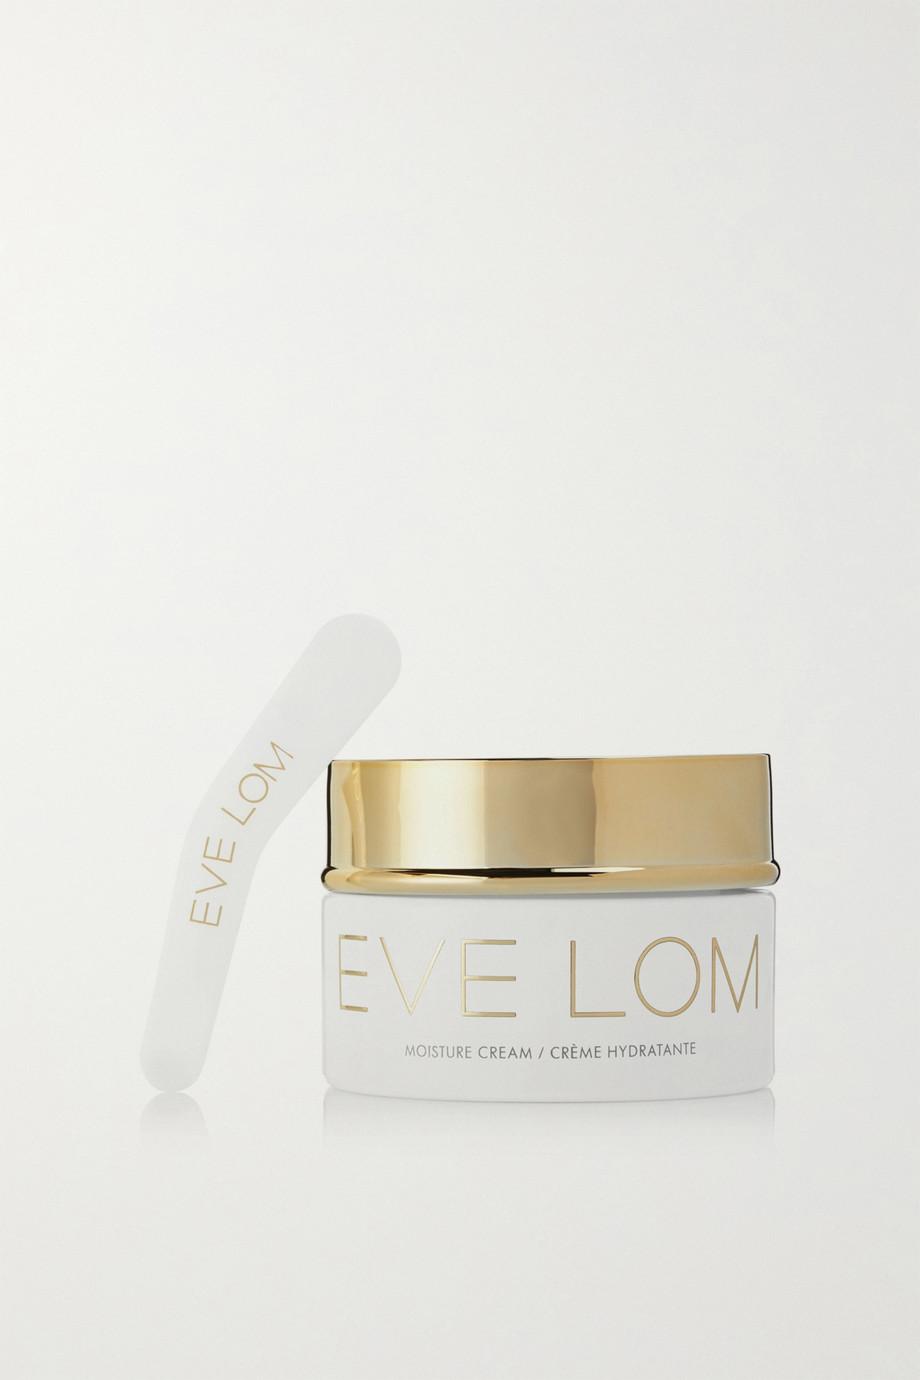 Eve Lom Moisture Cream, 50ml